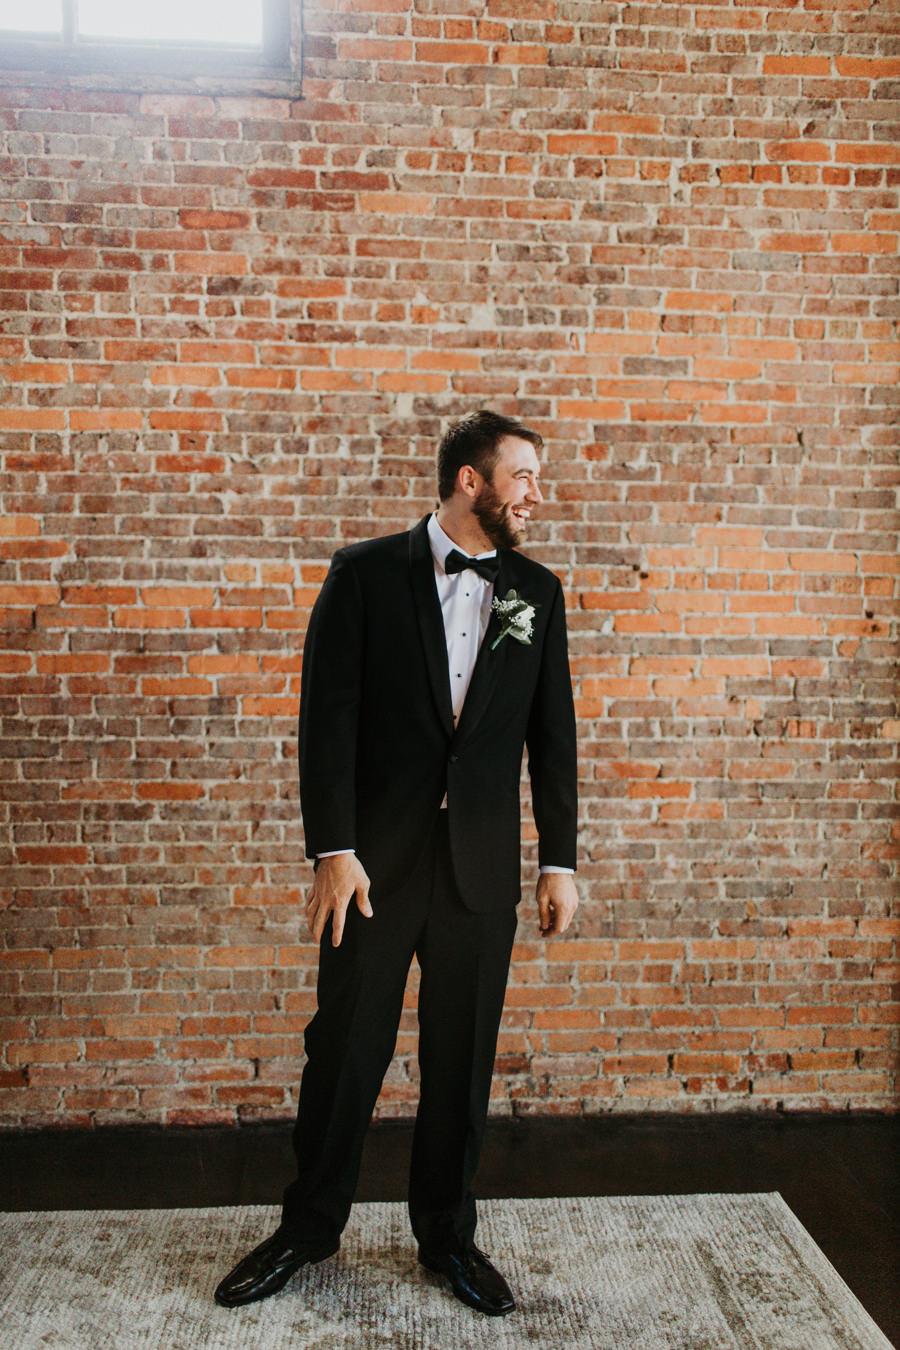 Tampa Heights Industrial Wedding at Cavu Emmy RJ-27.jpg